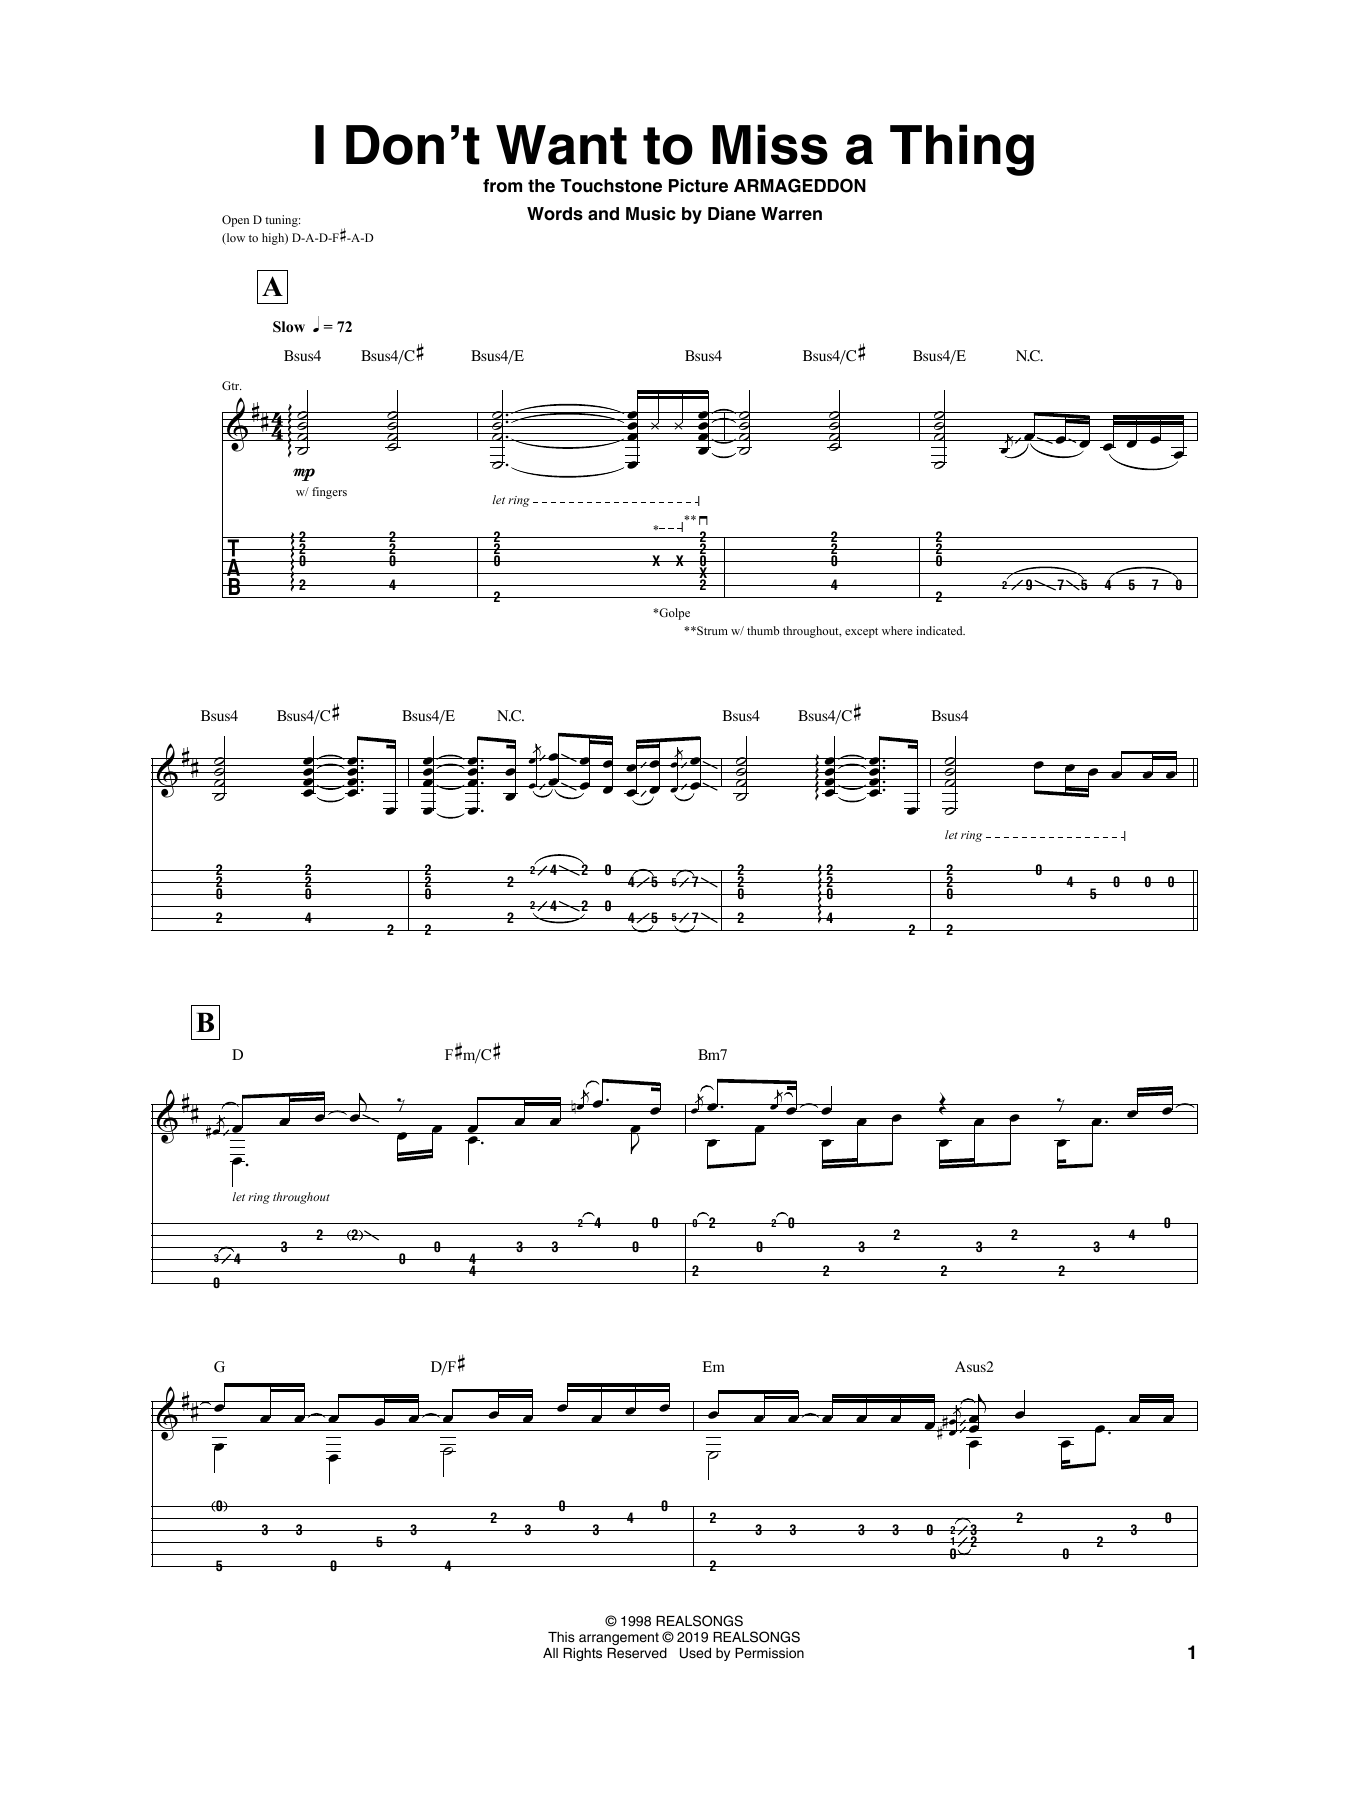 Igor Presnyakov 'I Don't Want To Miss A Thing' Sheet Music Notes, Chords    Download Printable Guitar Tab   SKU 15